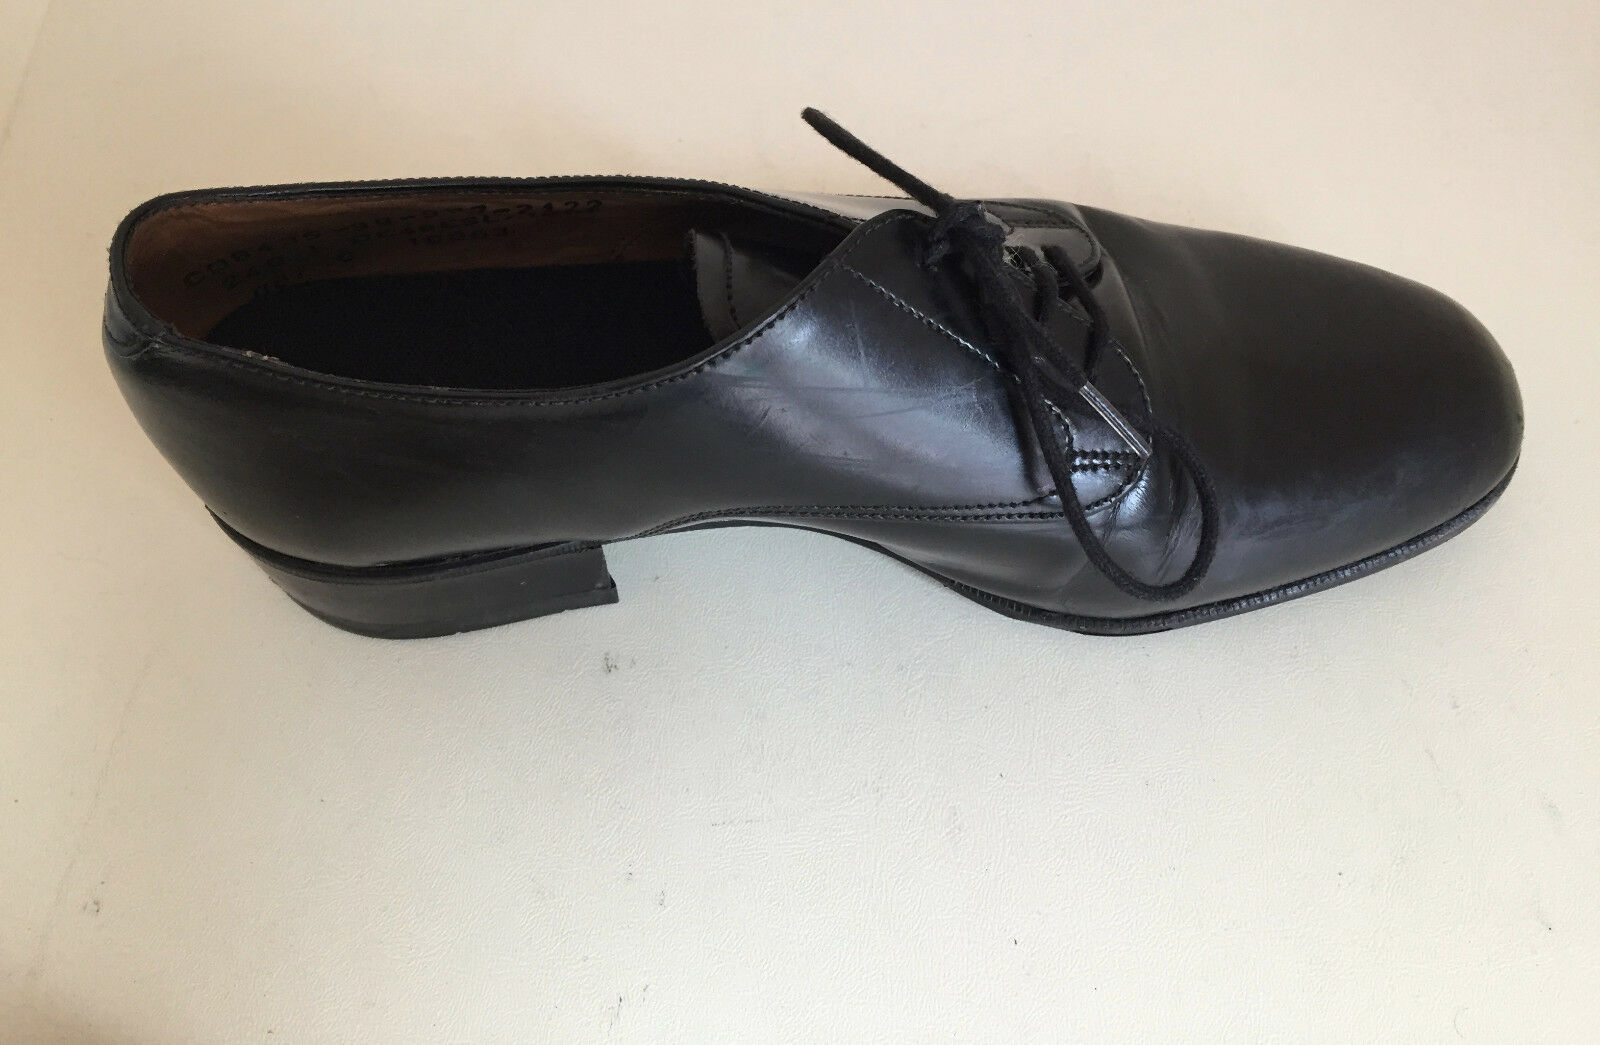 Mesdames cuir de brevet Plat Souliers Brogues Chaussures UK 5